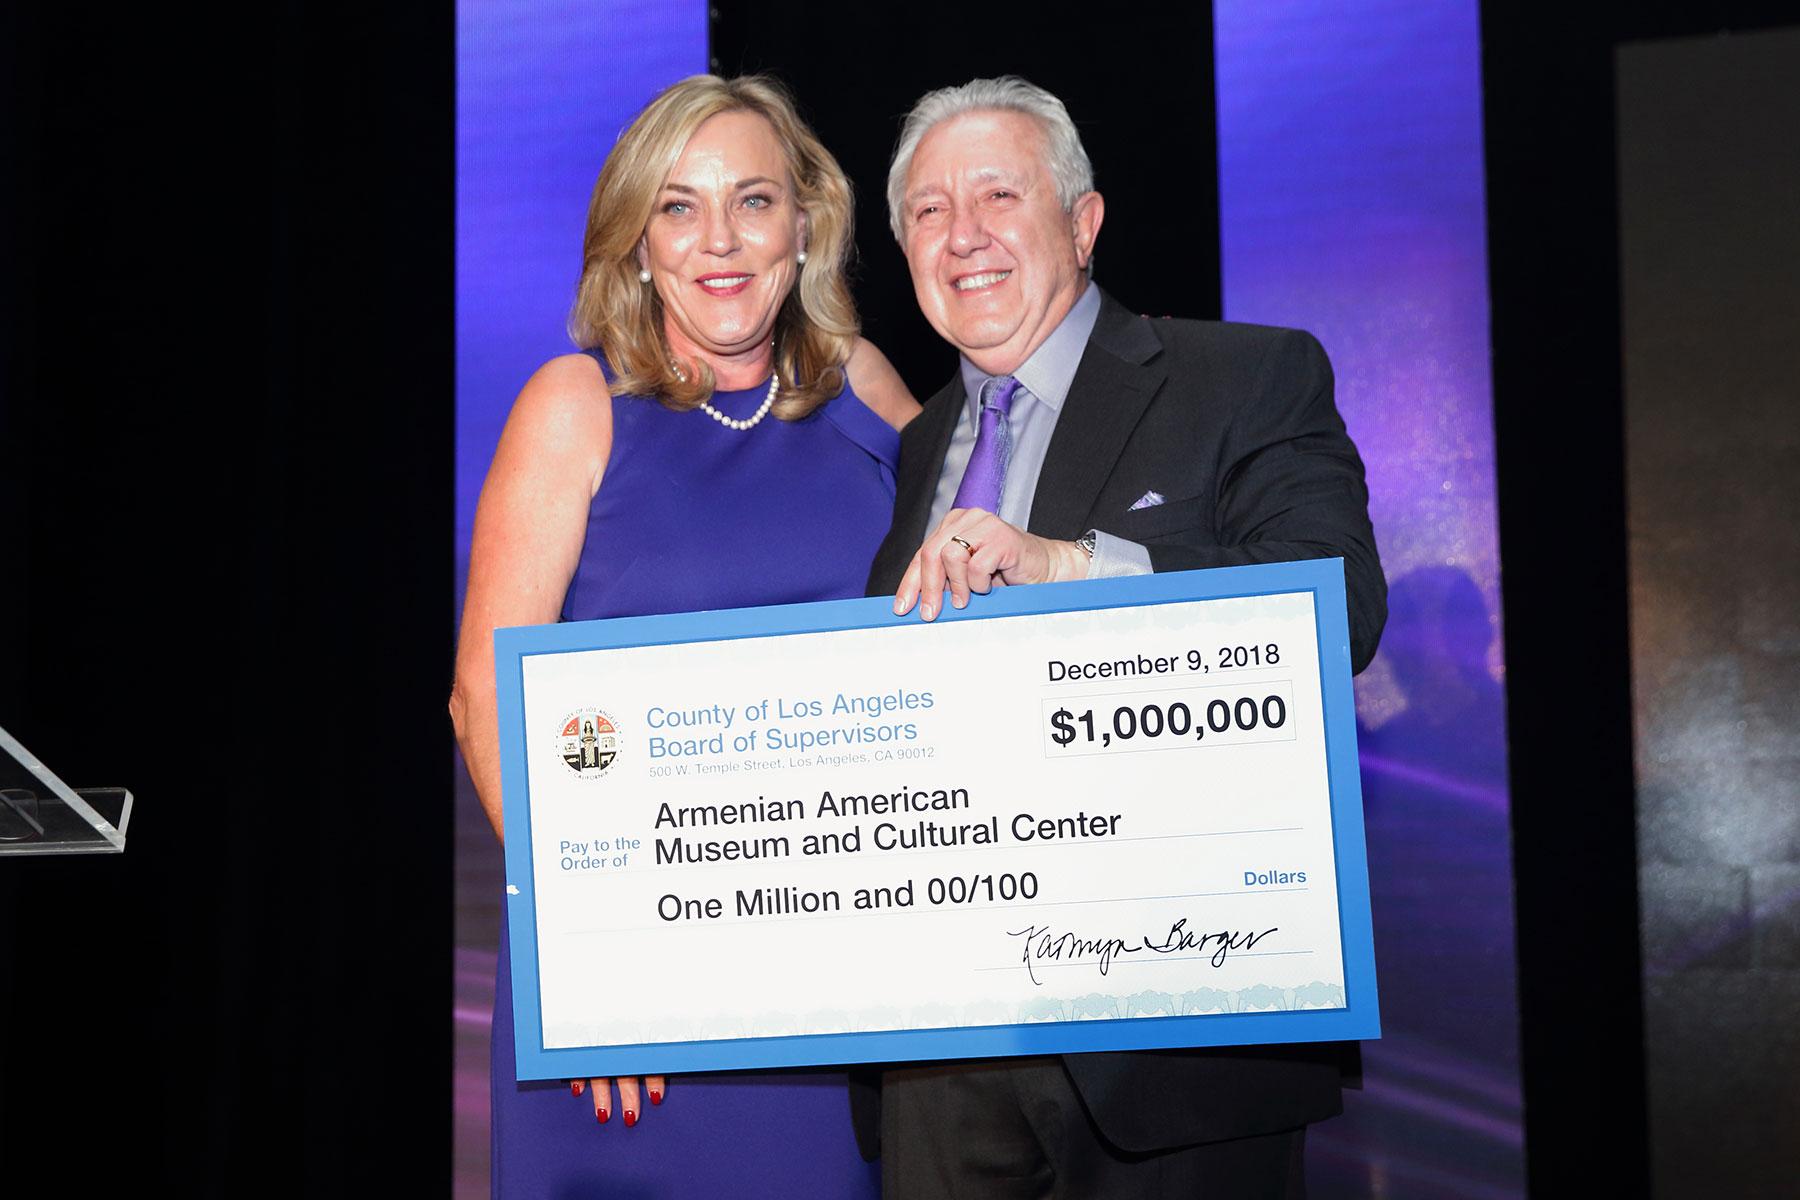 Los Angeles County Supervisor Kathryn Barger Presenting $1 Million Check to Armenian American Museum Executive Chairman Berdj Karapetian